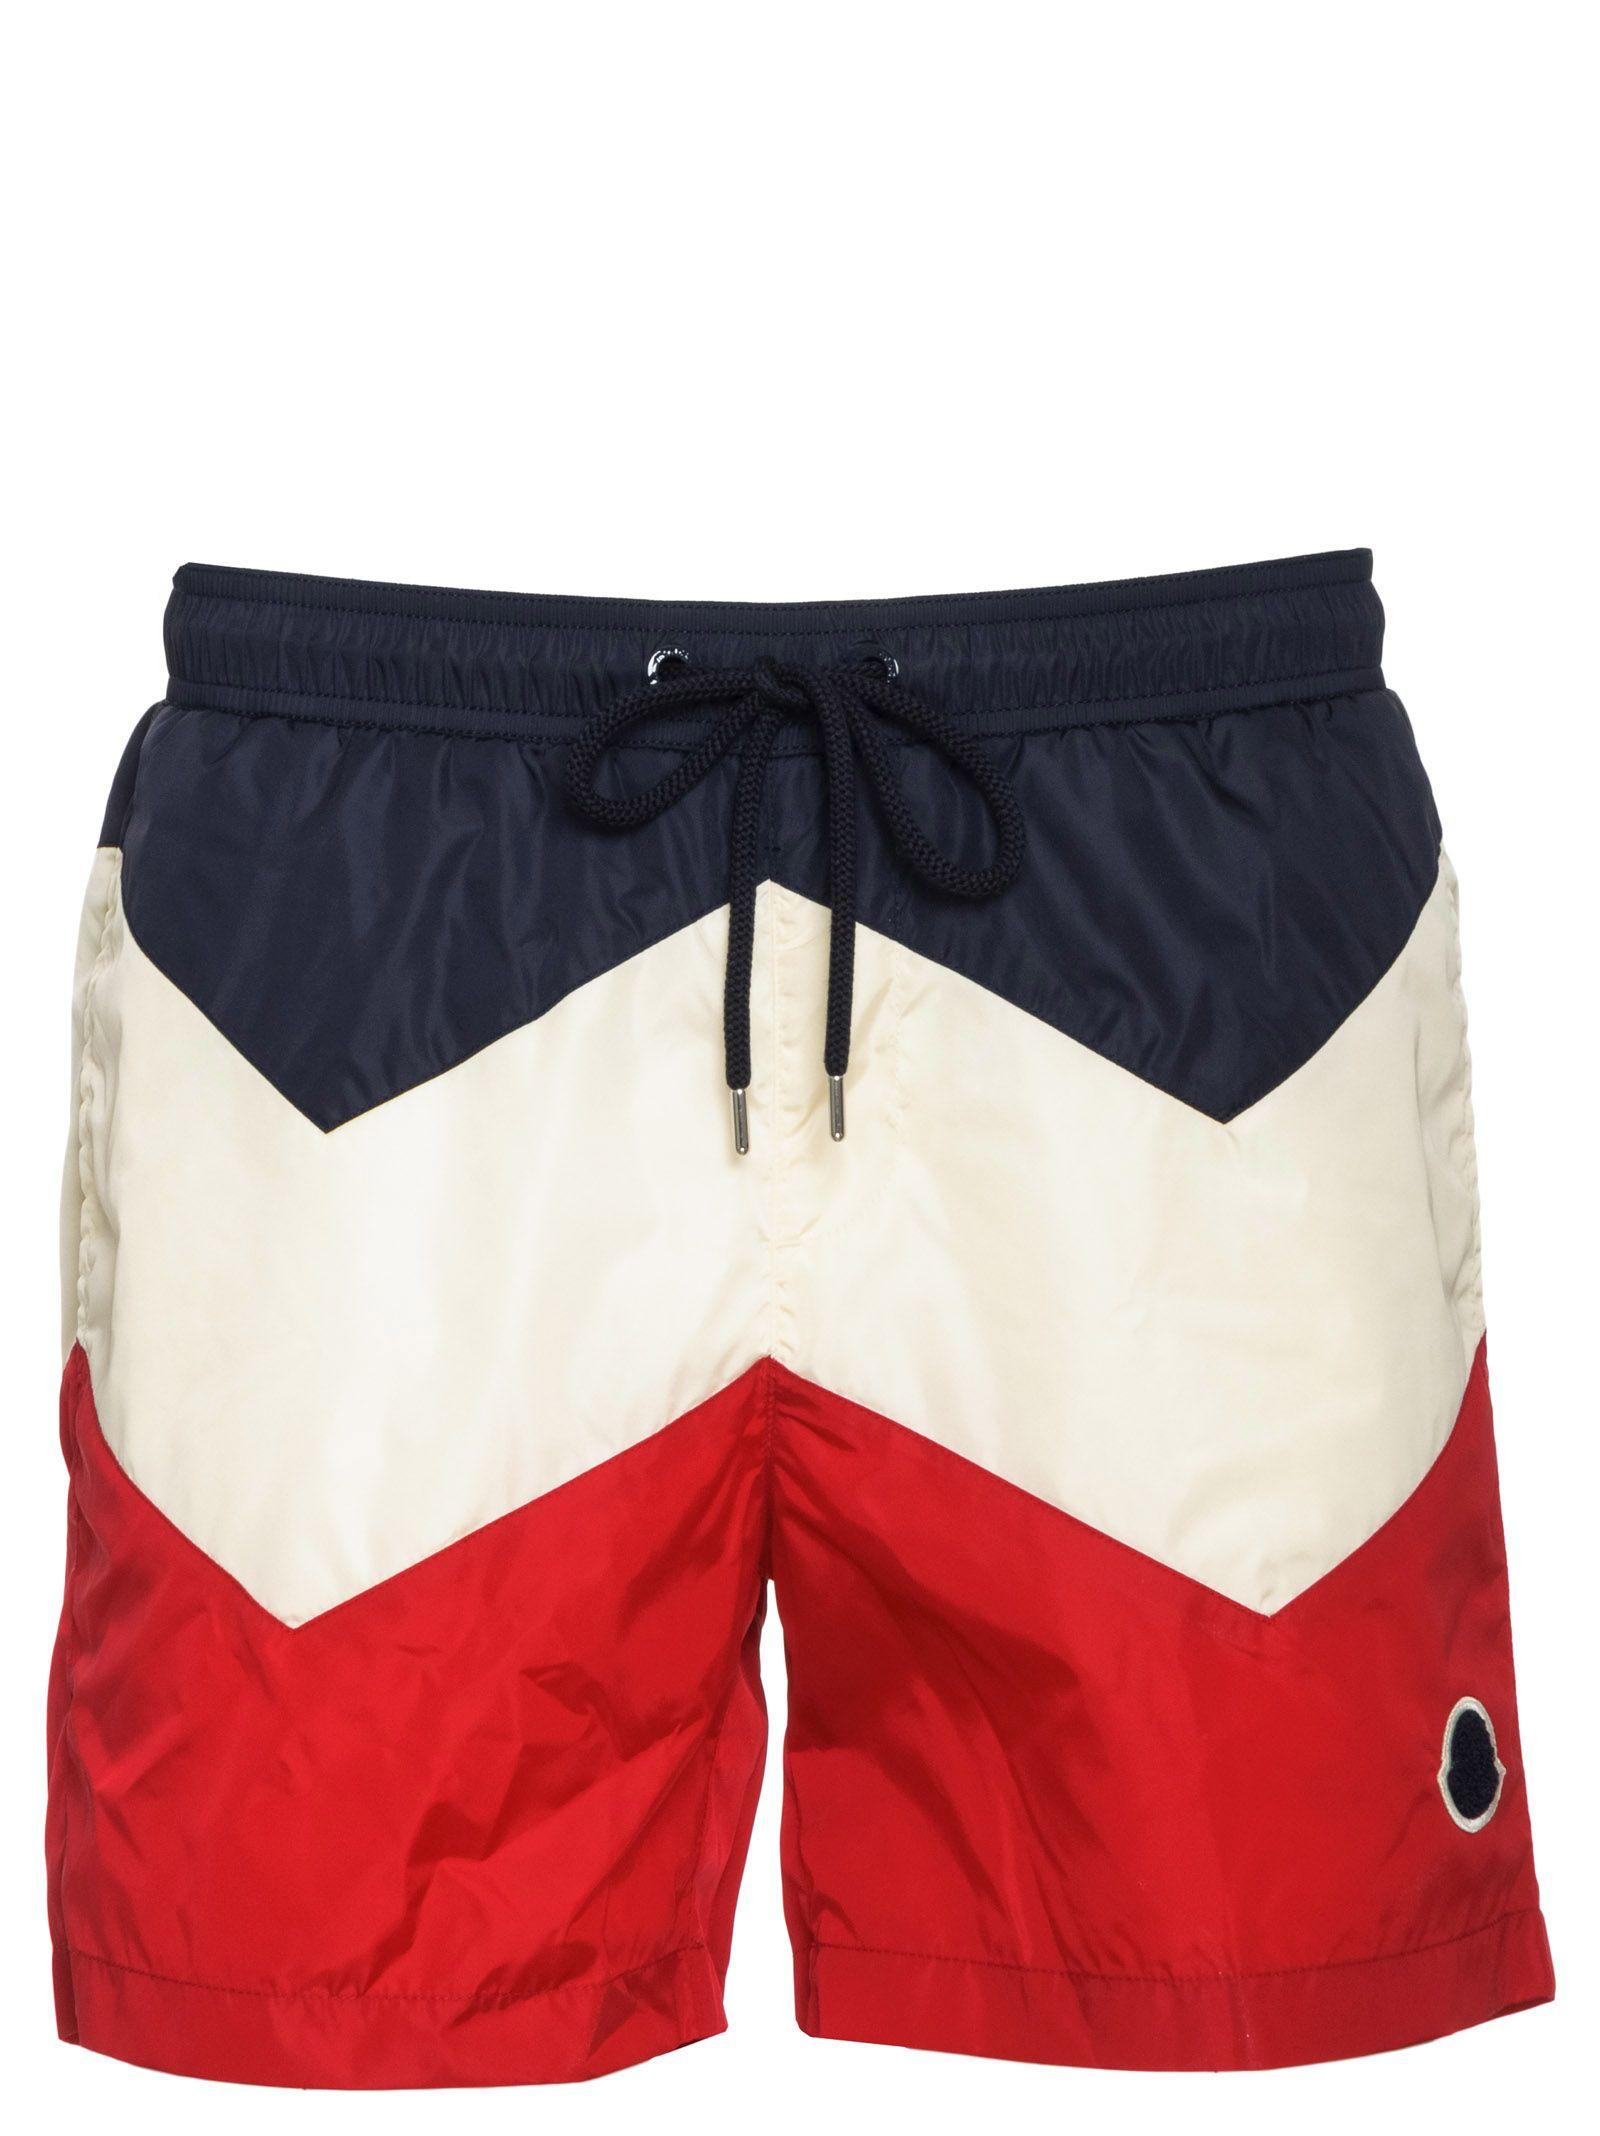 b4c420bd5 Moncler Moncler Tricolor Swim Shorts - Navy/white/red - 10848787 ...